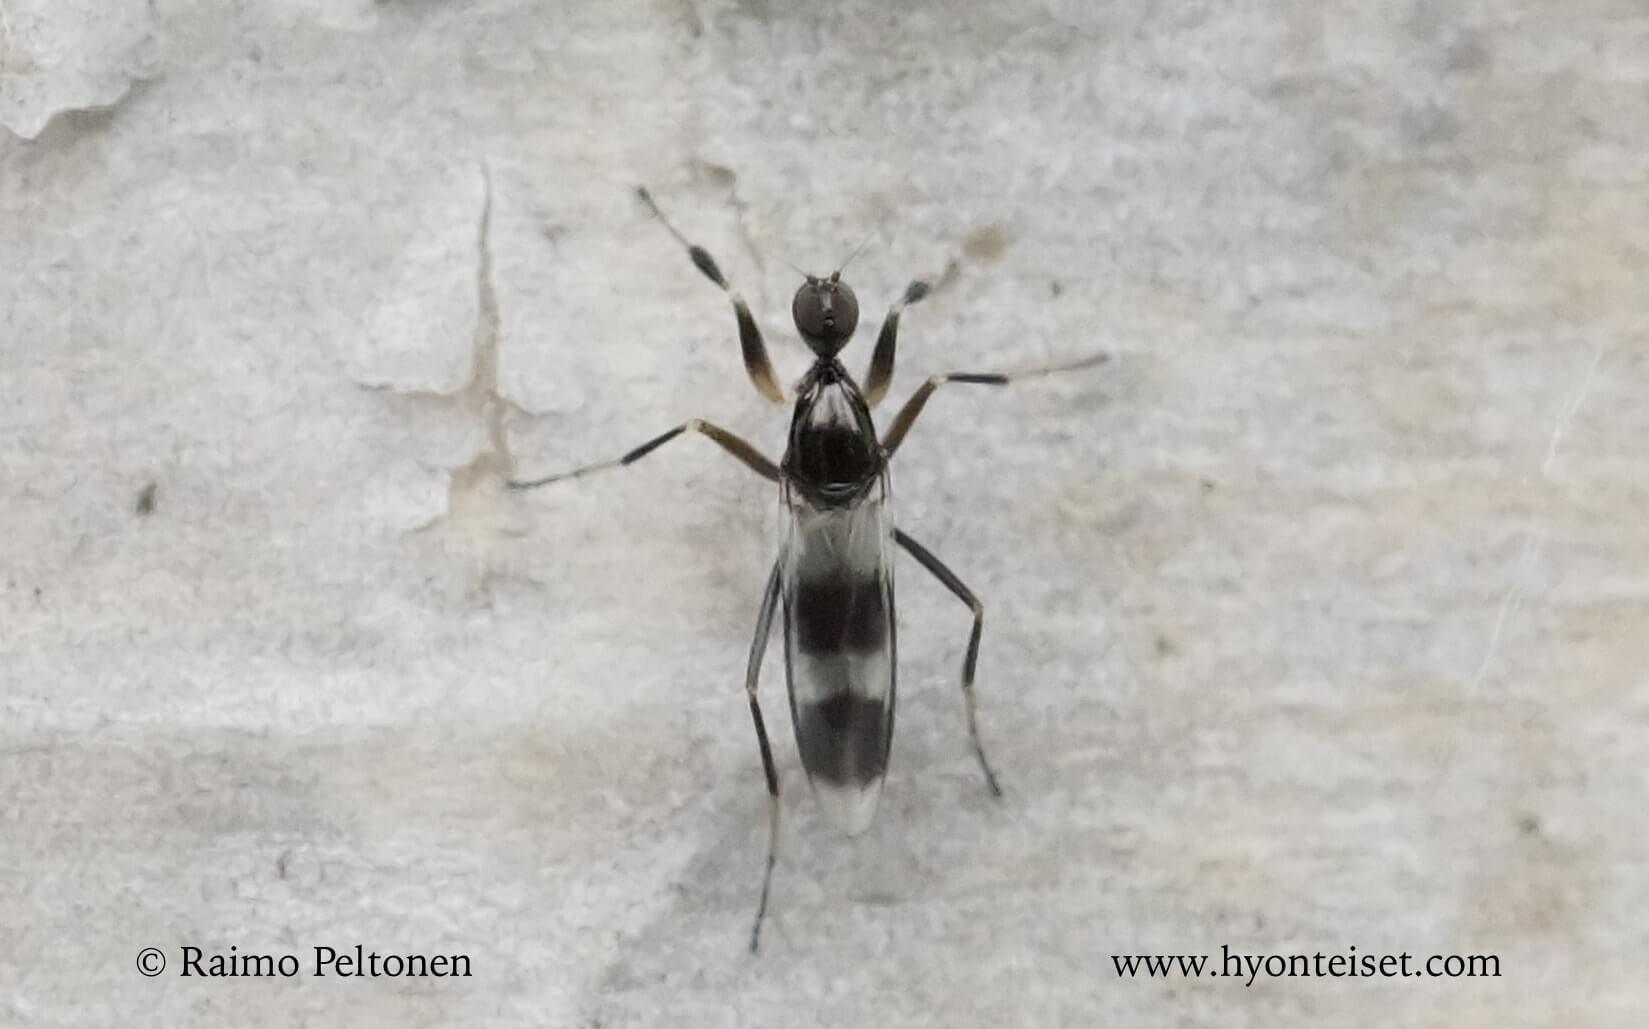 Tachydromia unbrarum (det. Kaj Winqvist)